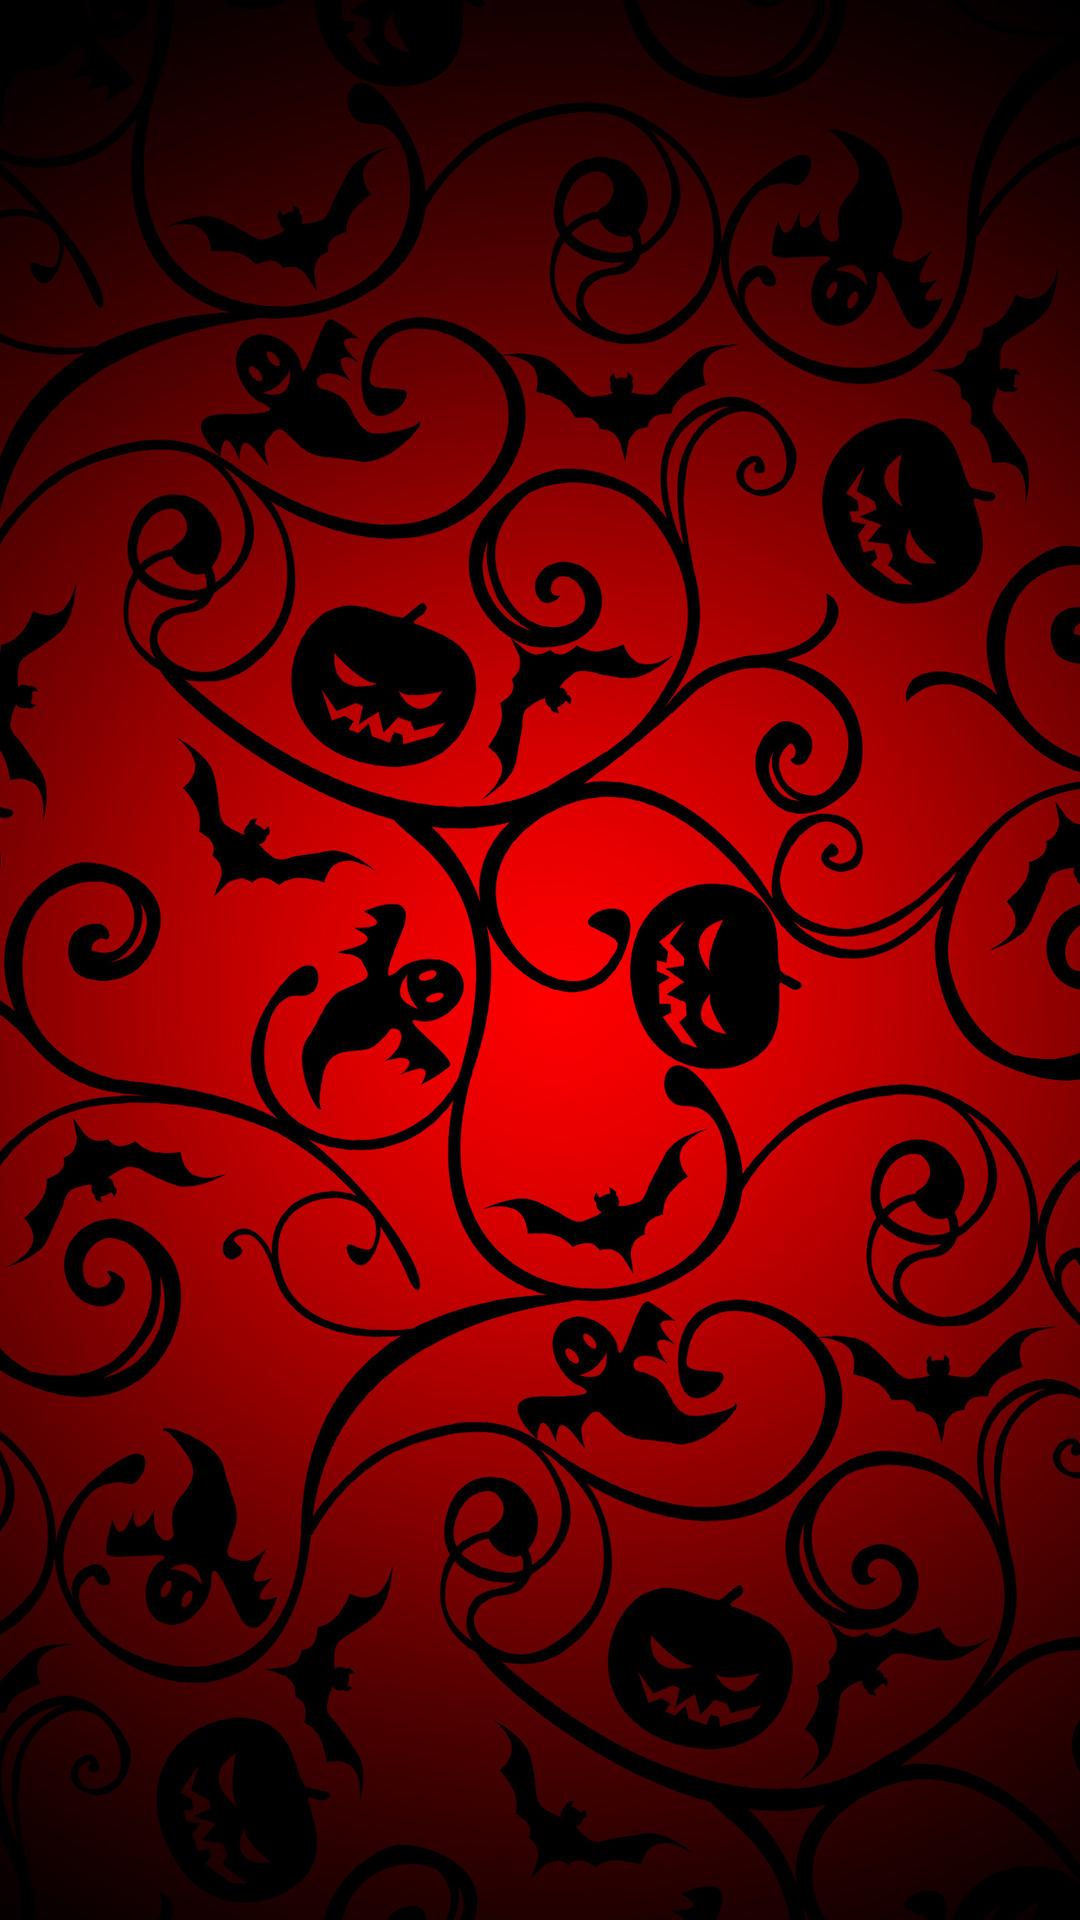 Wallpapers Hd Para Facebook Halloween Wallpapers Iphone Y Android Fondos De Pantalla